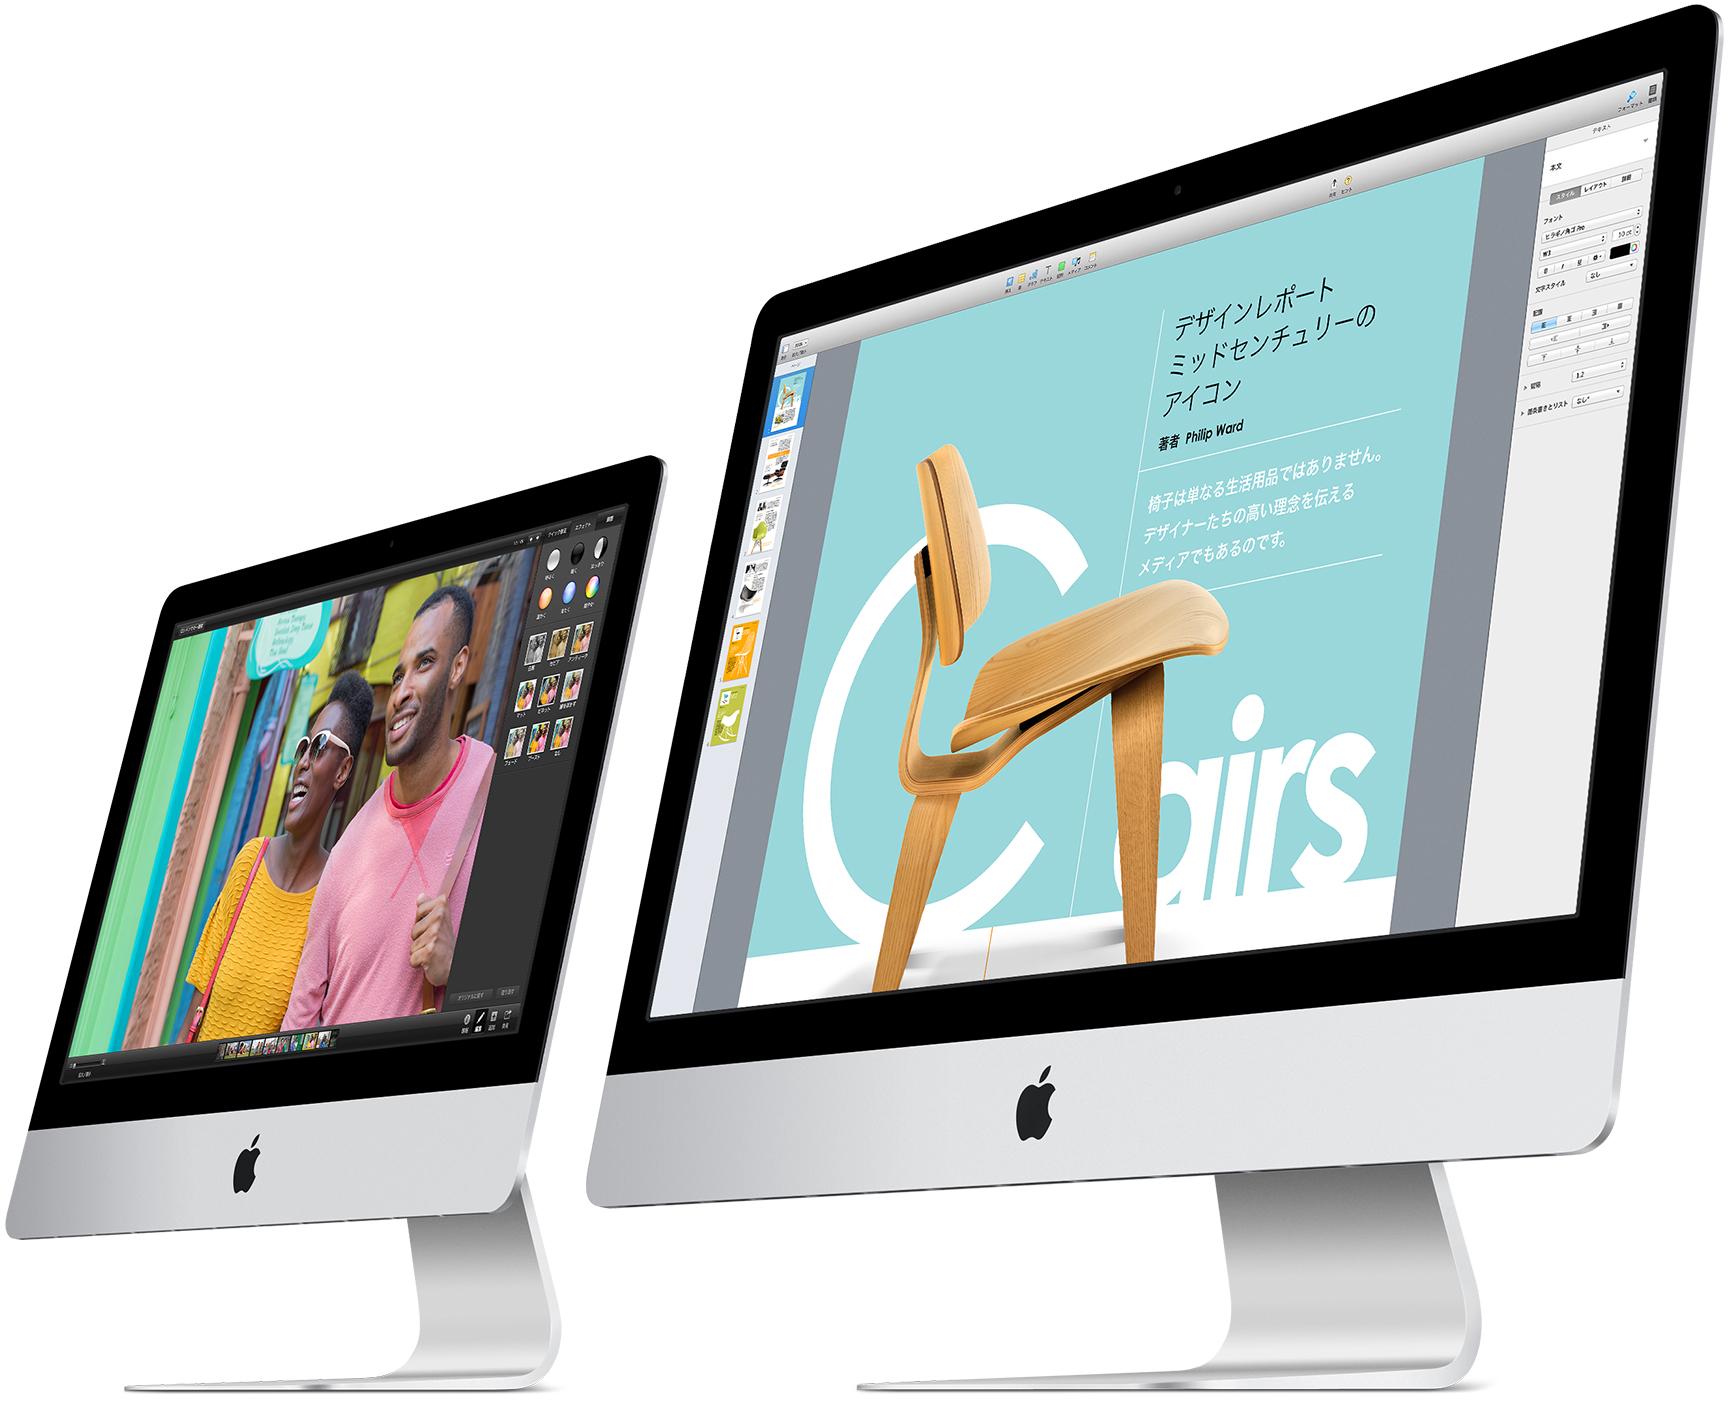 iMac 21.5 inch(Mid, 2014)